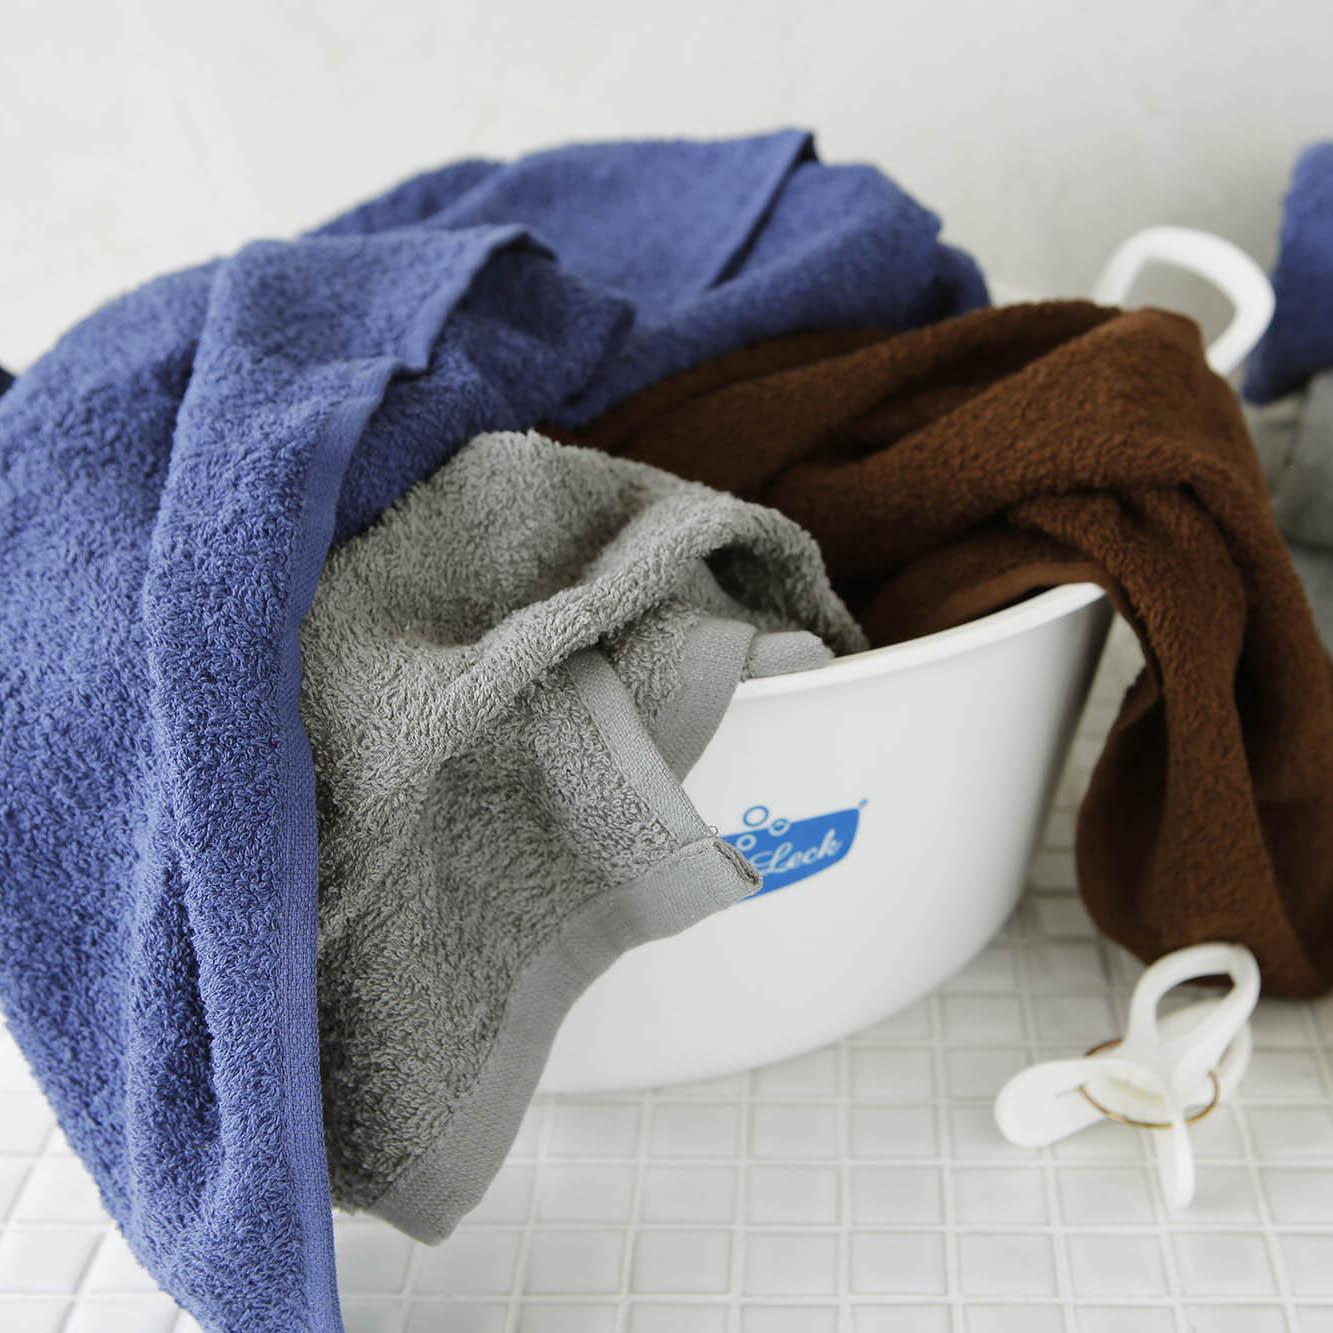 <SALE>《新色》 バスタオルお試し1枚  バングラデシュ製ガムシャタオル[ゆうパケットでお届け  配達日時指定不可]